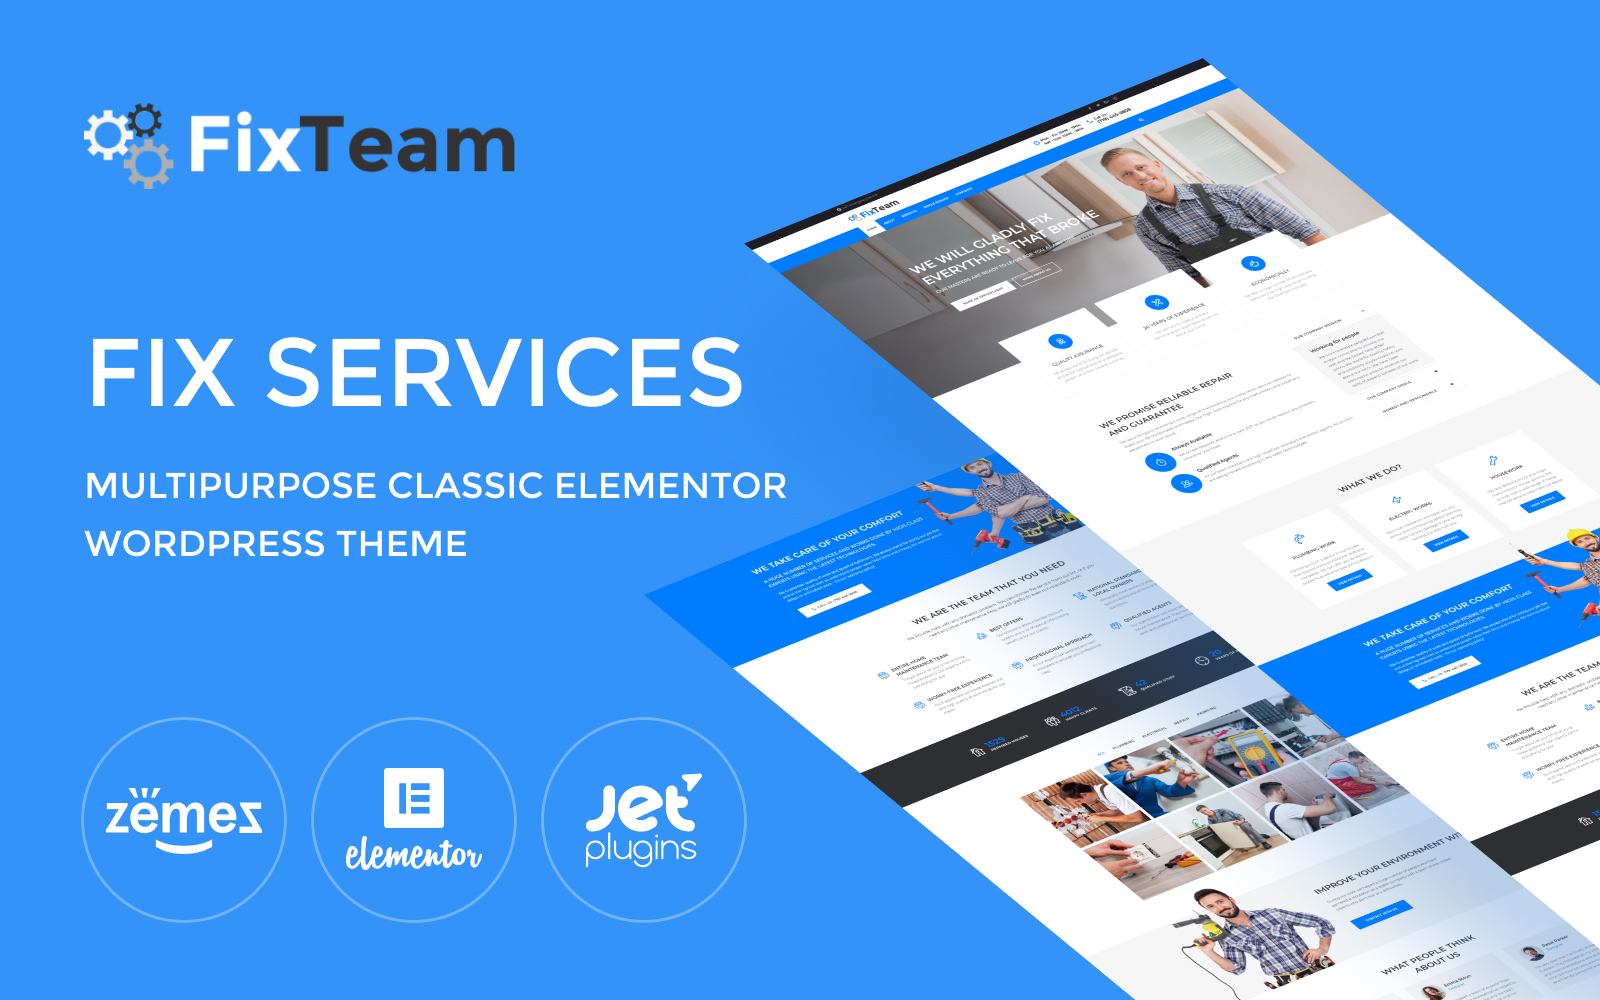 Reszponzív FixTeam - Fix Services Multipurpose Classic Elementor WordPress sablon 76462